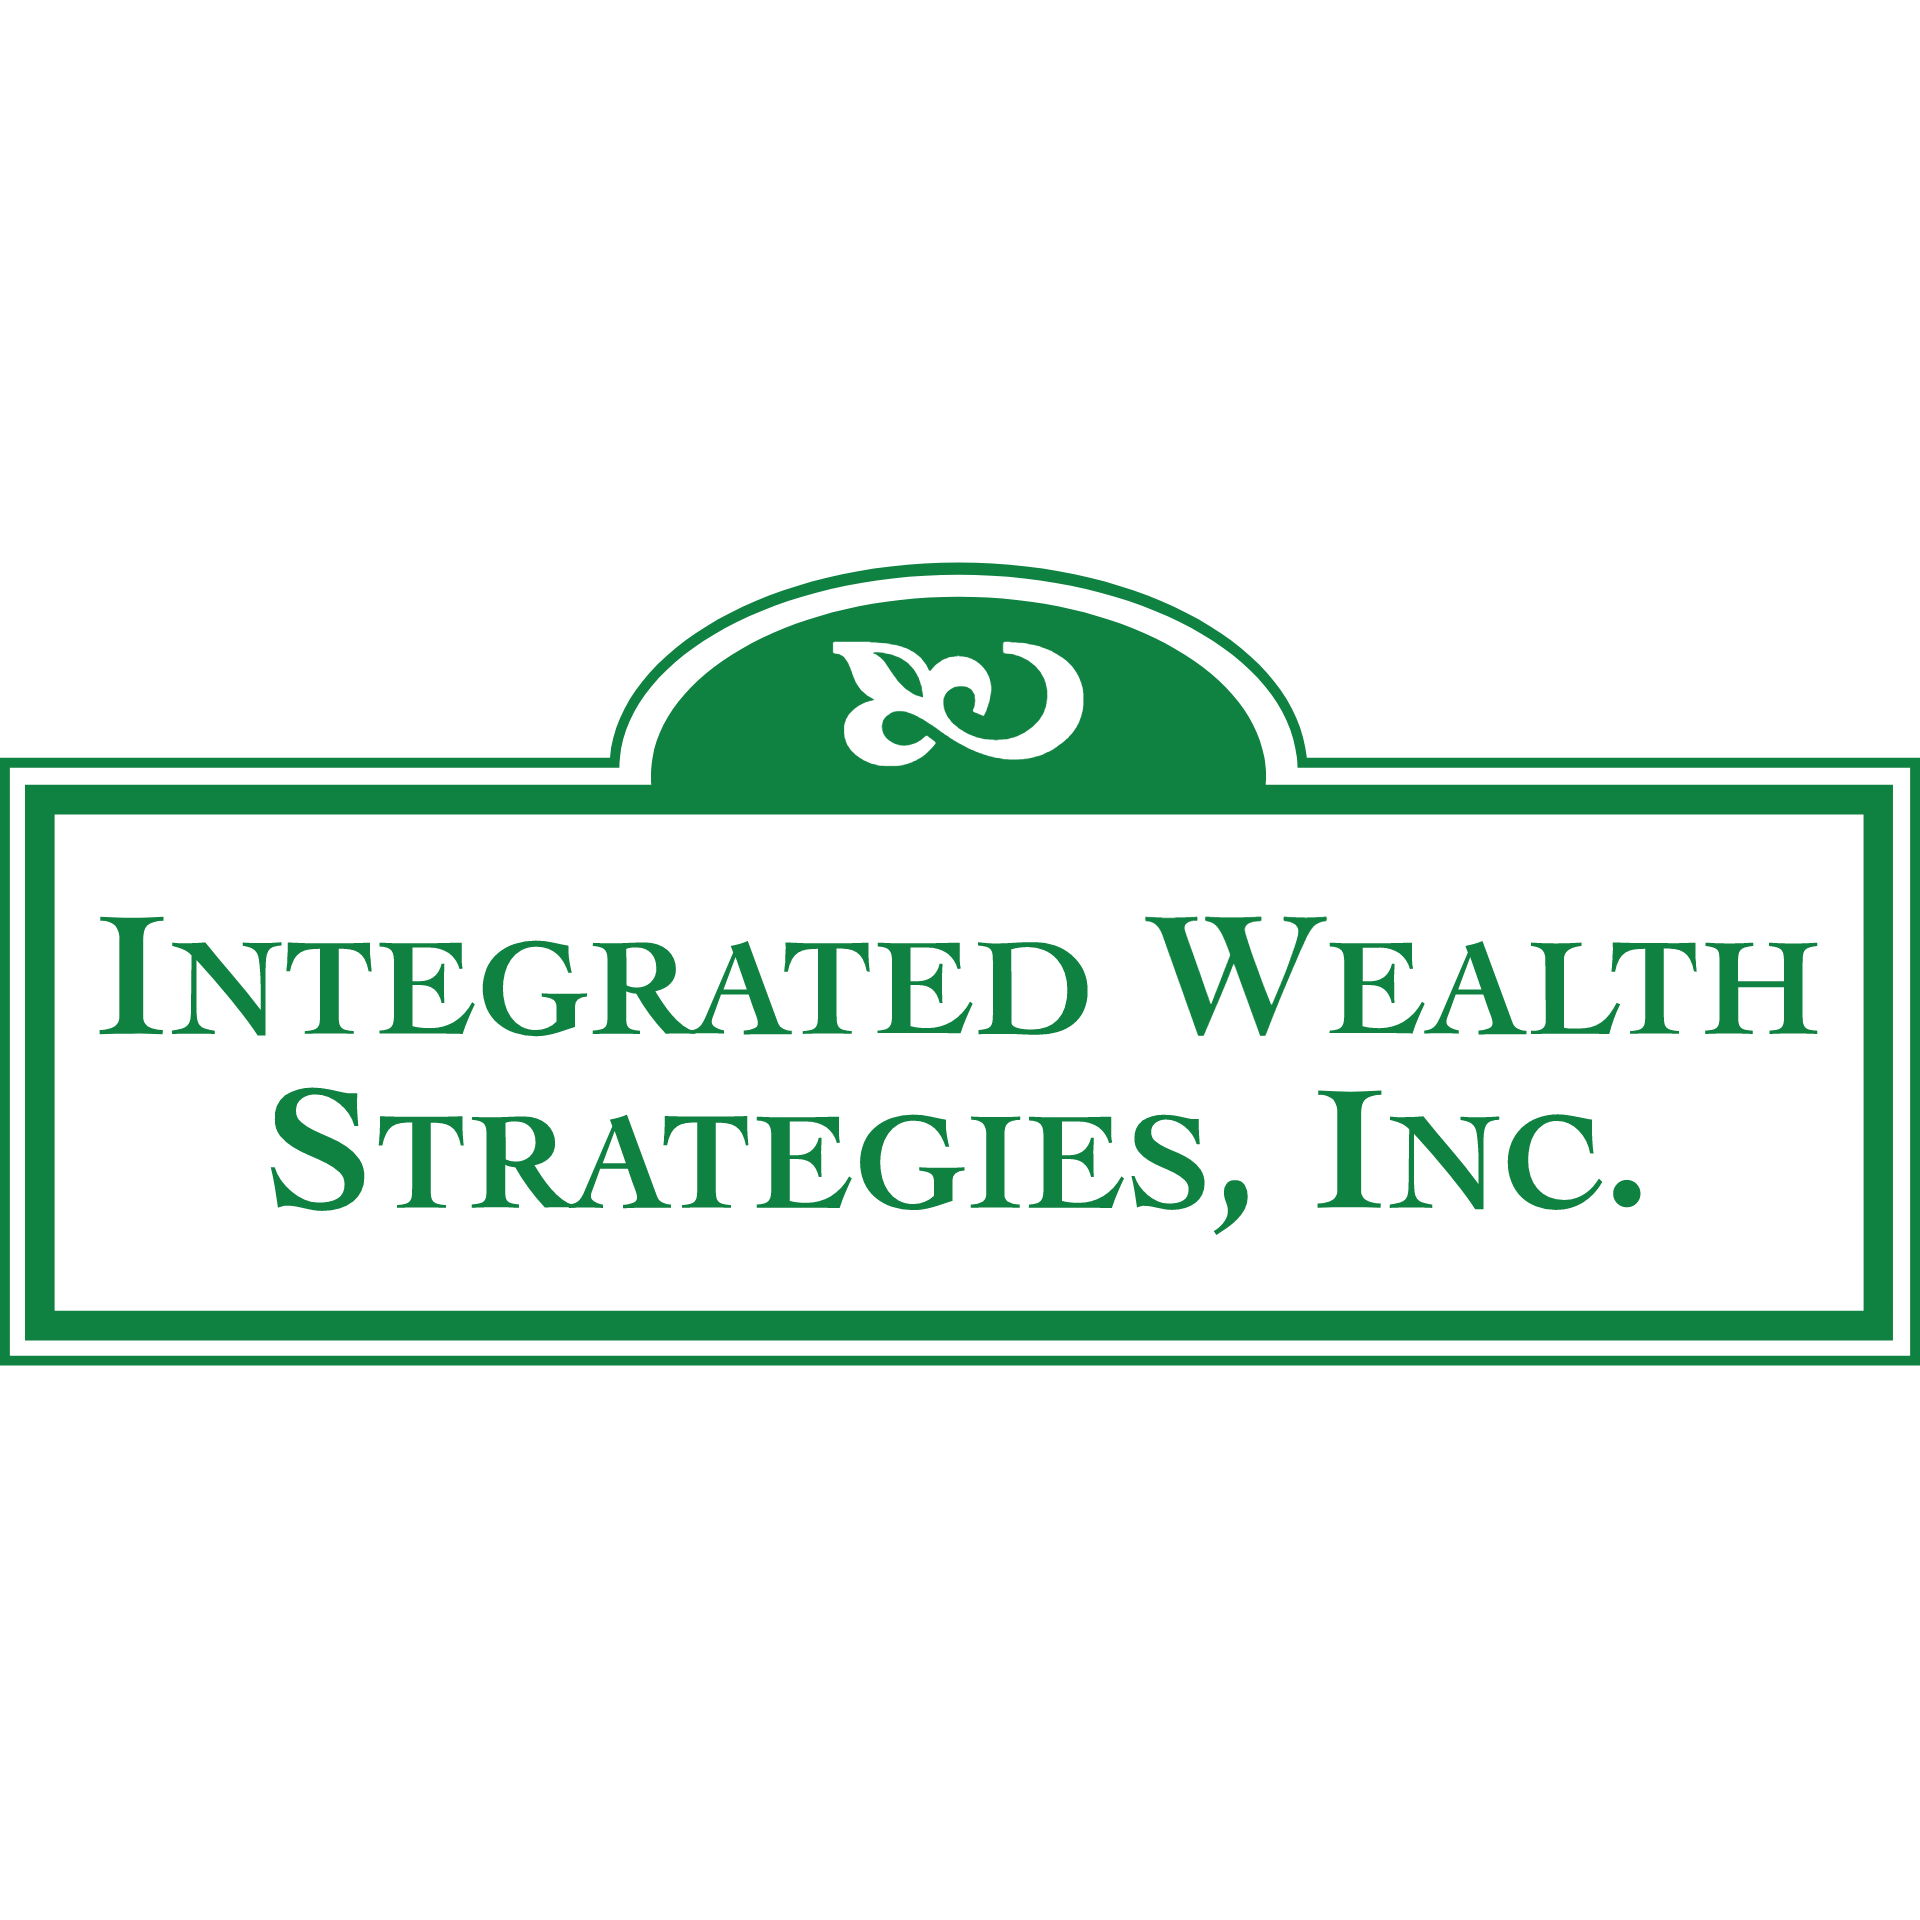 Integrated Wealth Strategies, Inc.